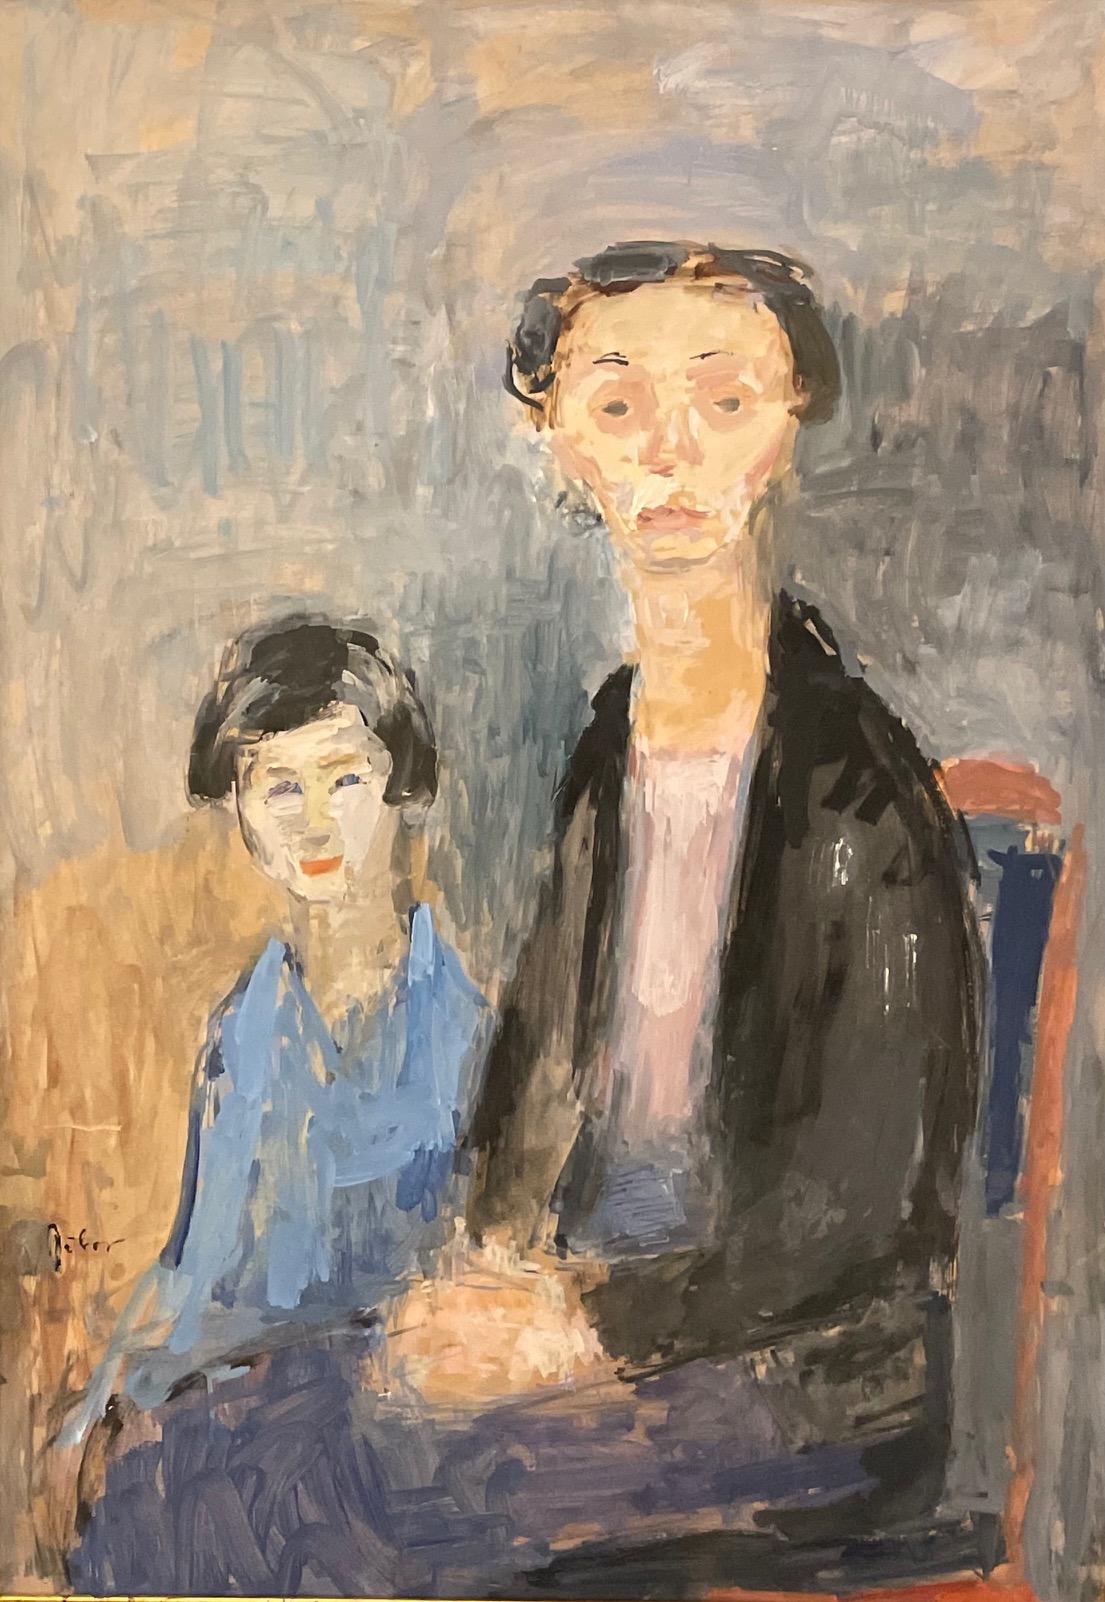 Gábor, Marianne: With Tanti